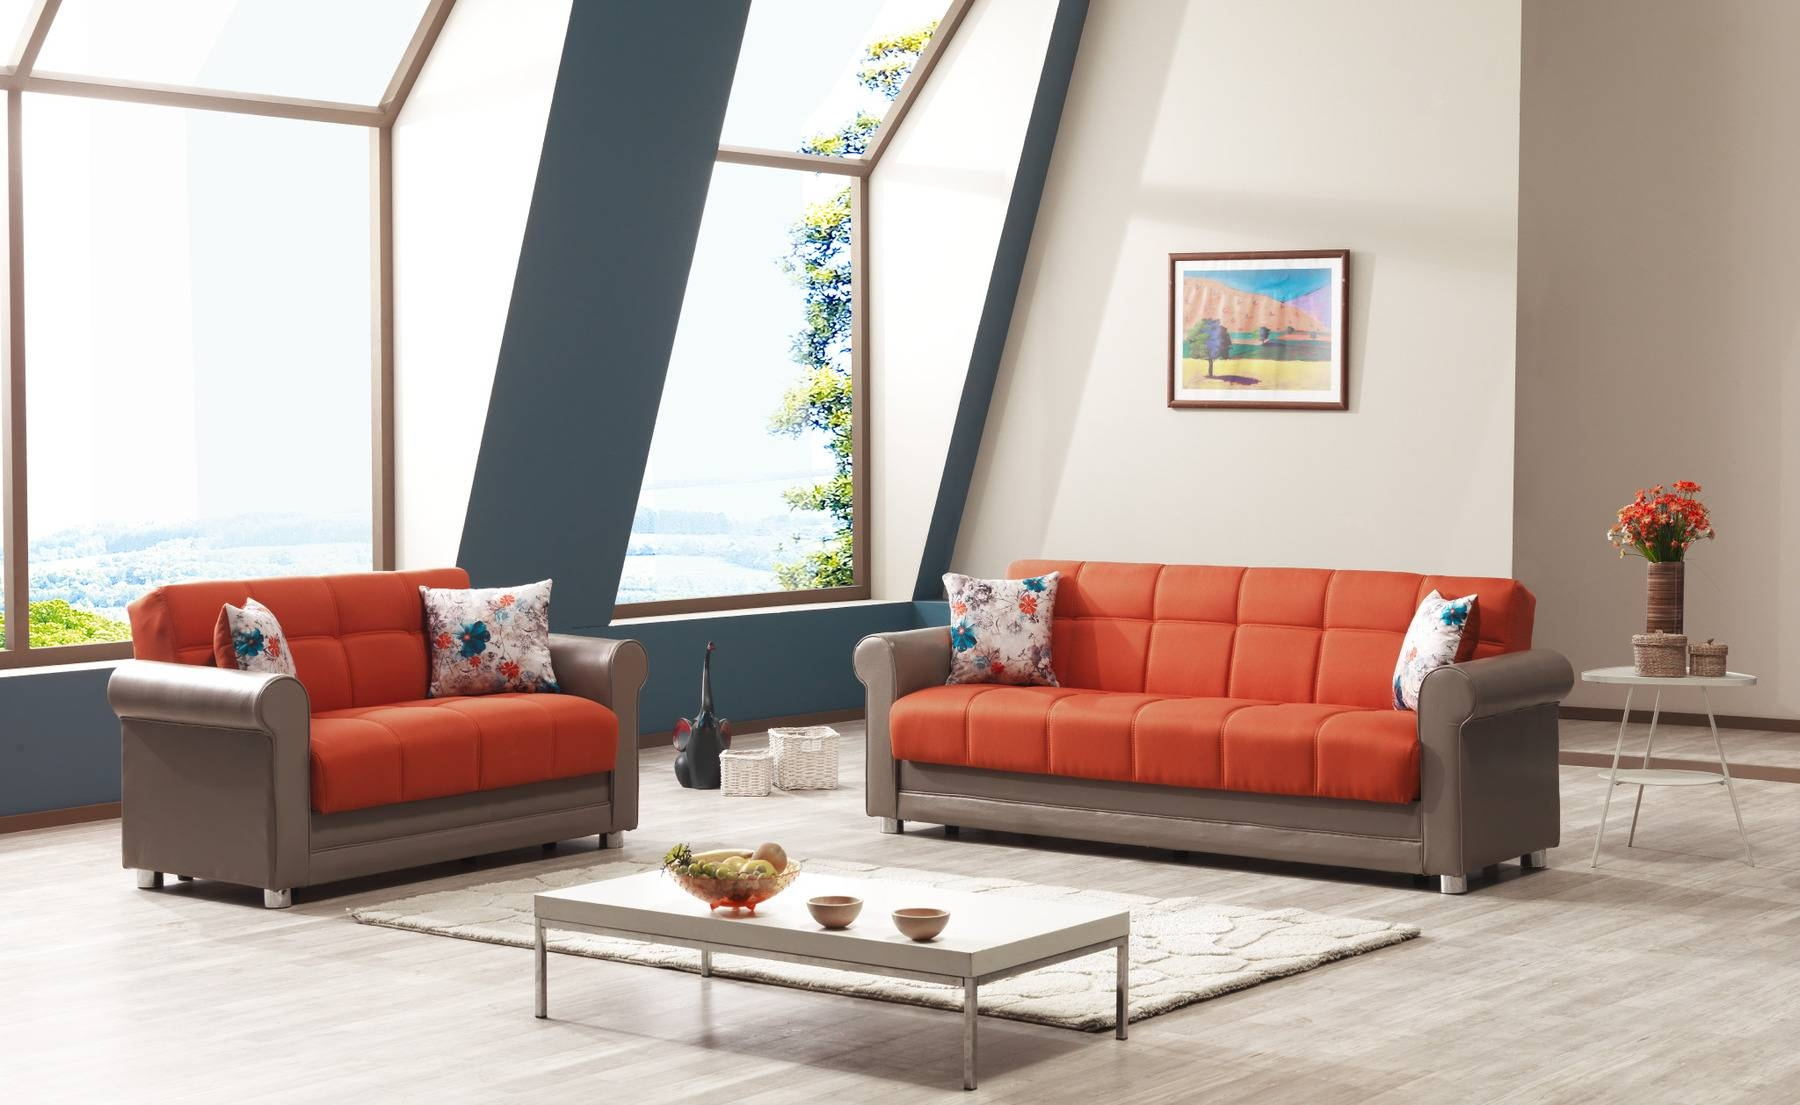 Avalon Prusa Orange Sofa Avalon Casamode Furniture Fabric Sofas At with regard to Fabric Sofas (Image 1 of 30)